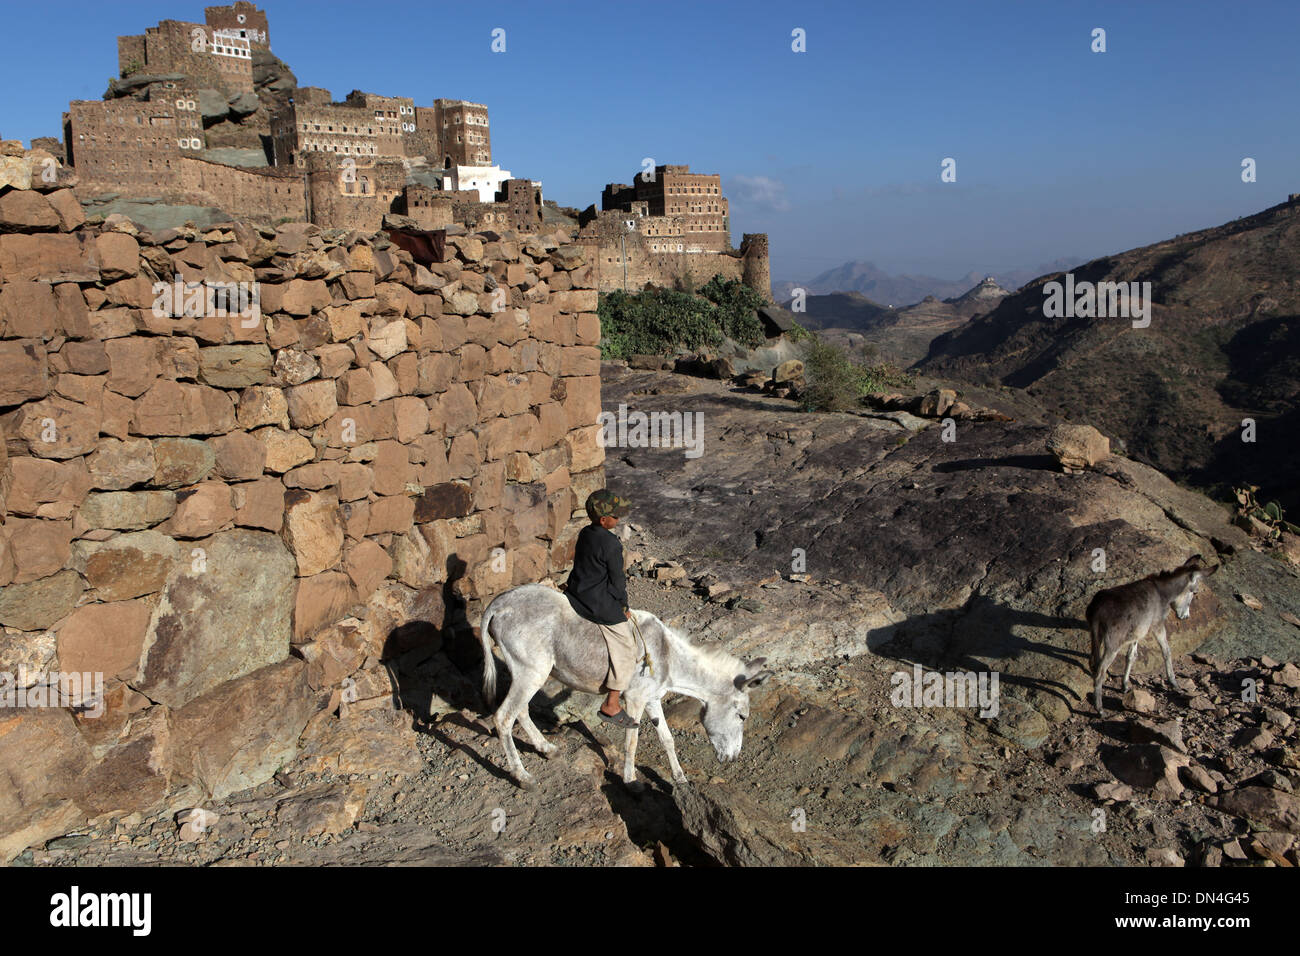 Haraz mountains, Yemen. - Stock Image